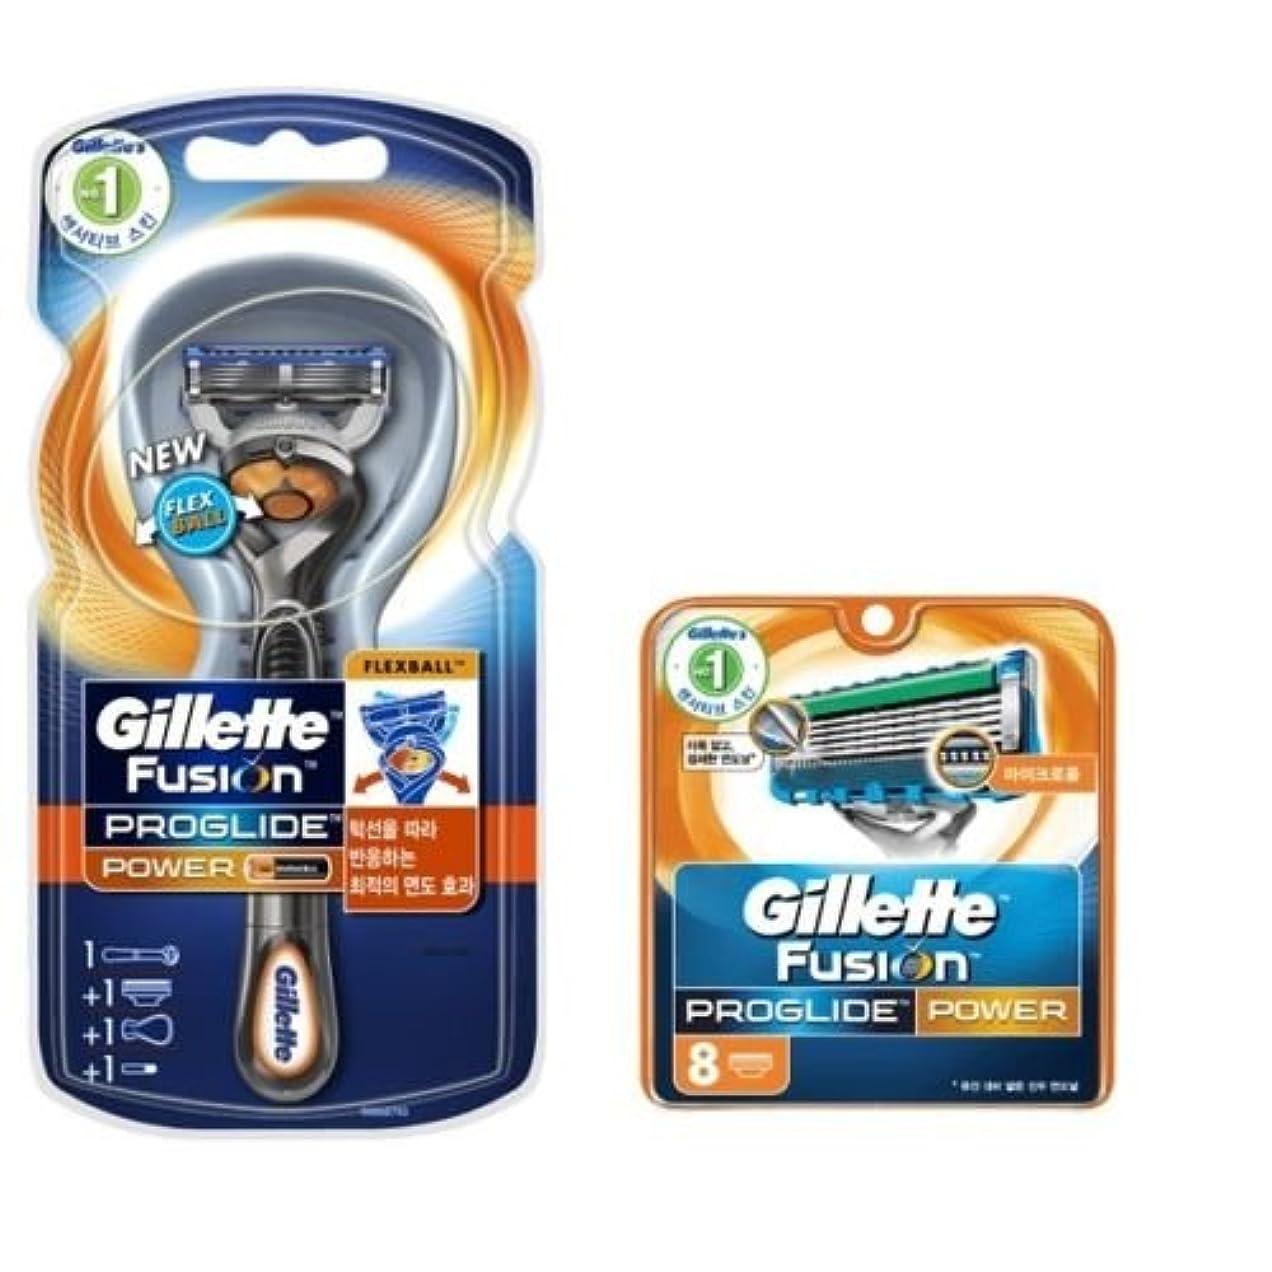 Gillette Fusion Proglide Flexball Power Men's 1 剃刀 9 かみそりの刃 [並行輸入品]